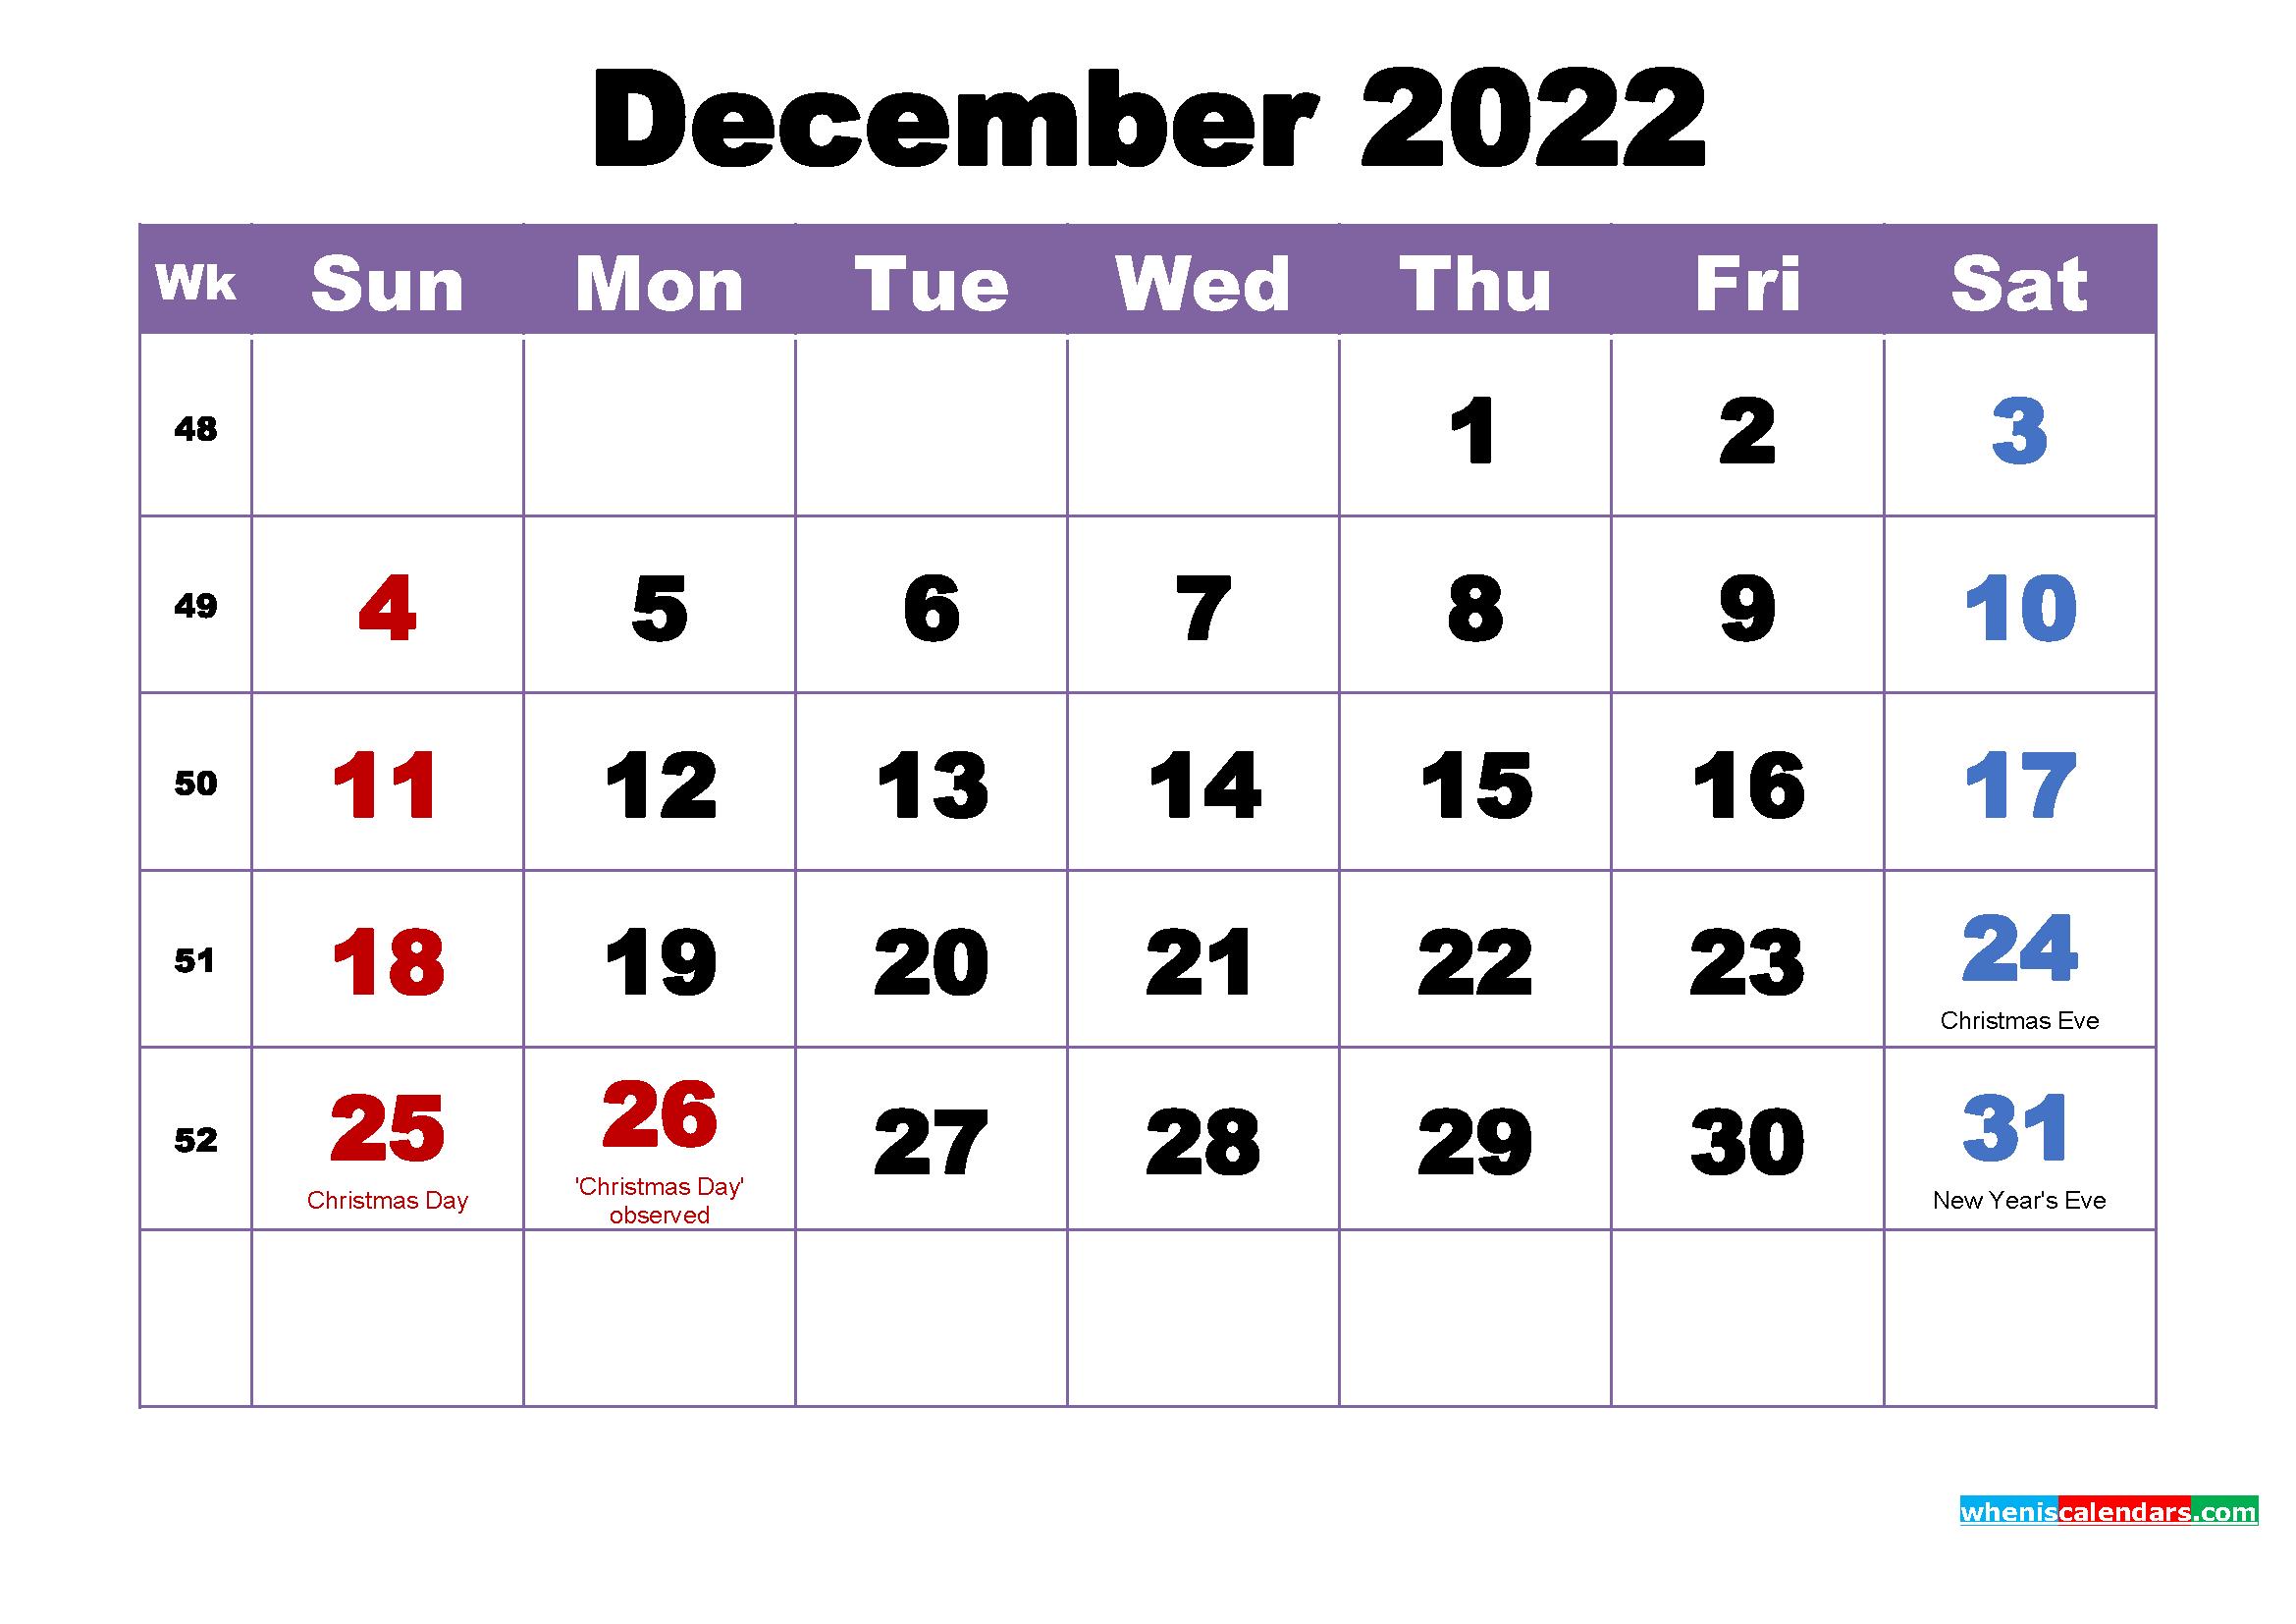 Free Printable December 2022 Calendar Wallpaper